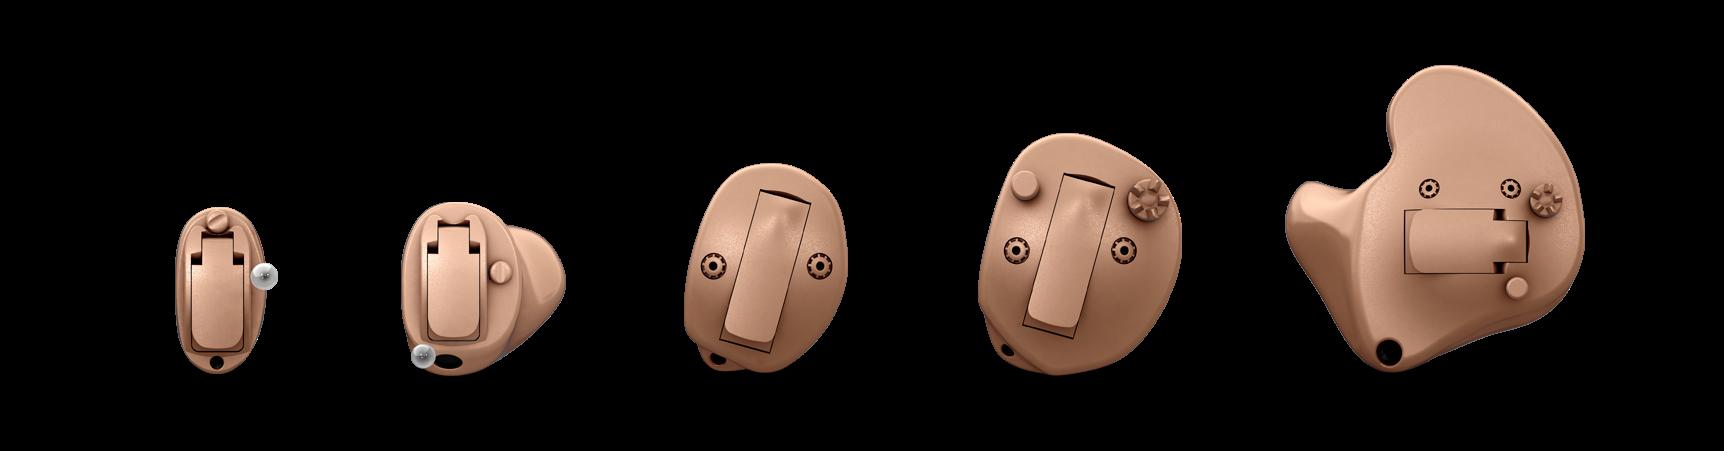 Oticon Opn Custom Styles